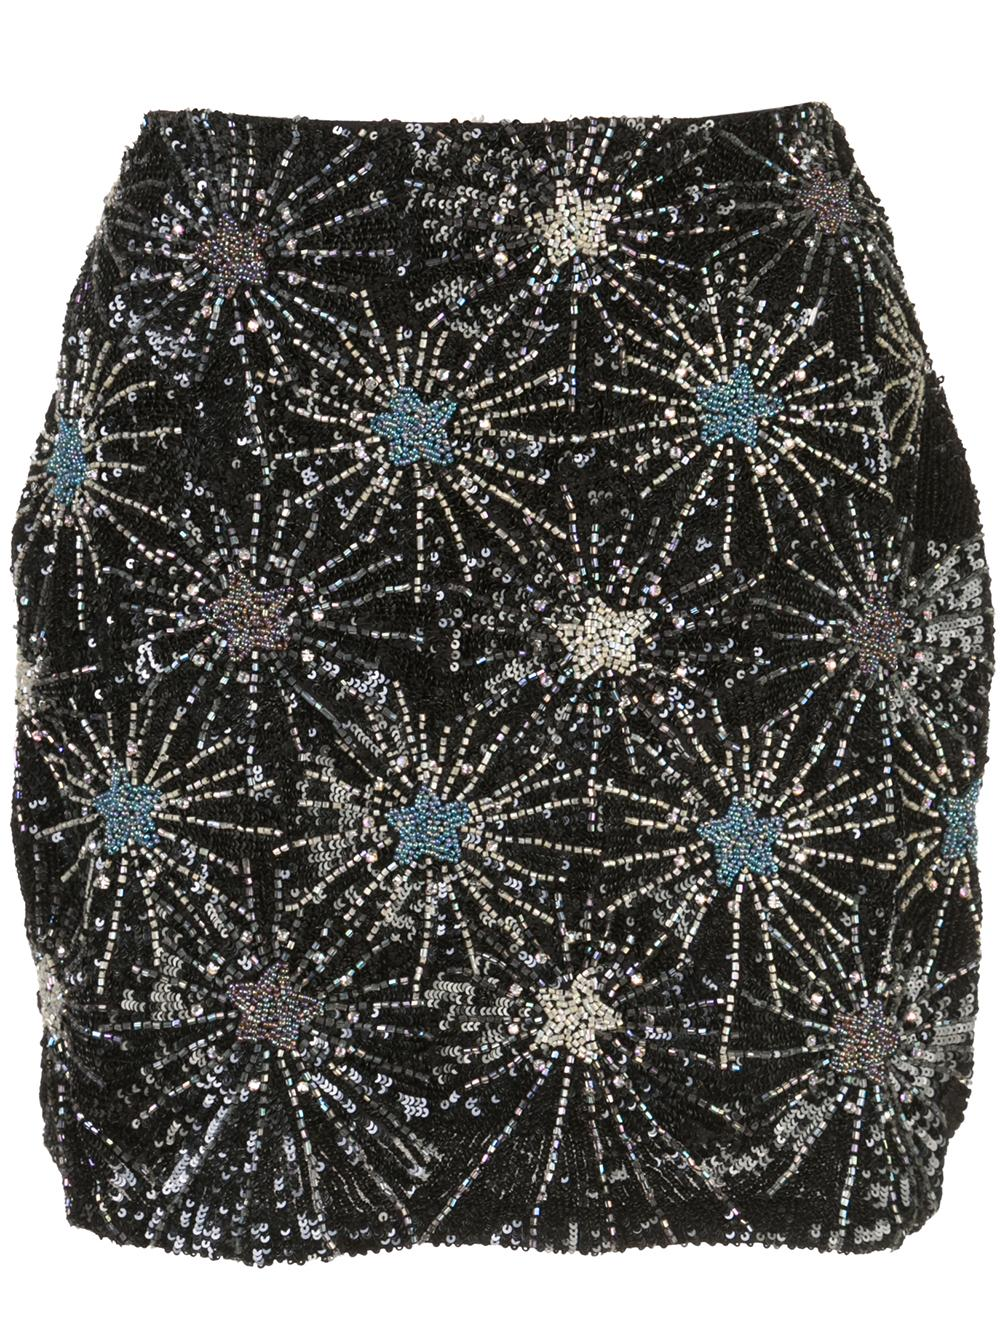 Yvonne Star Burst Skirt Item # PF19-2242